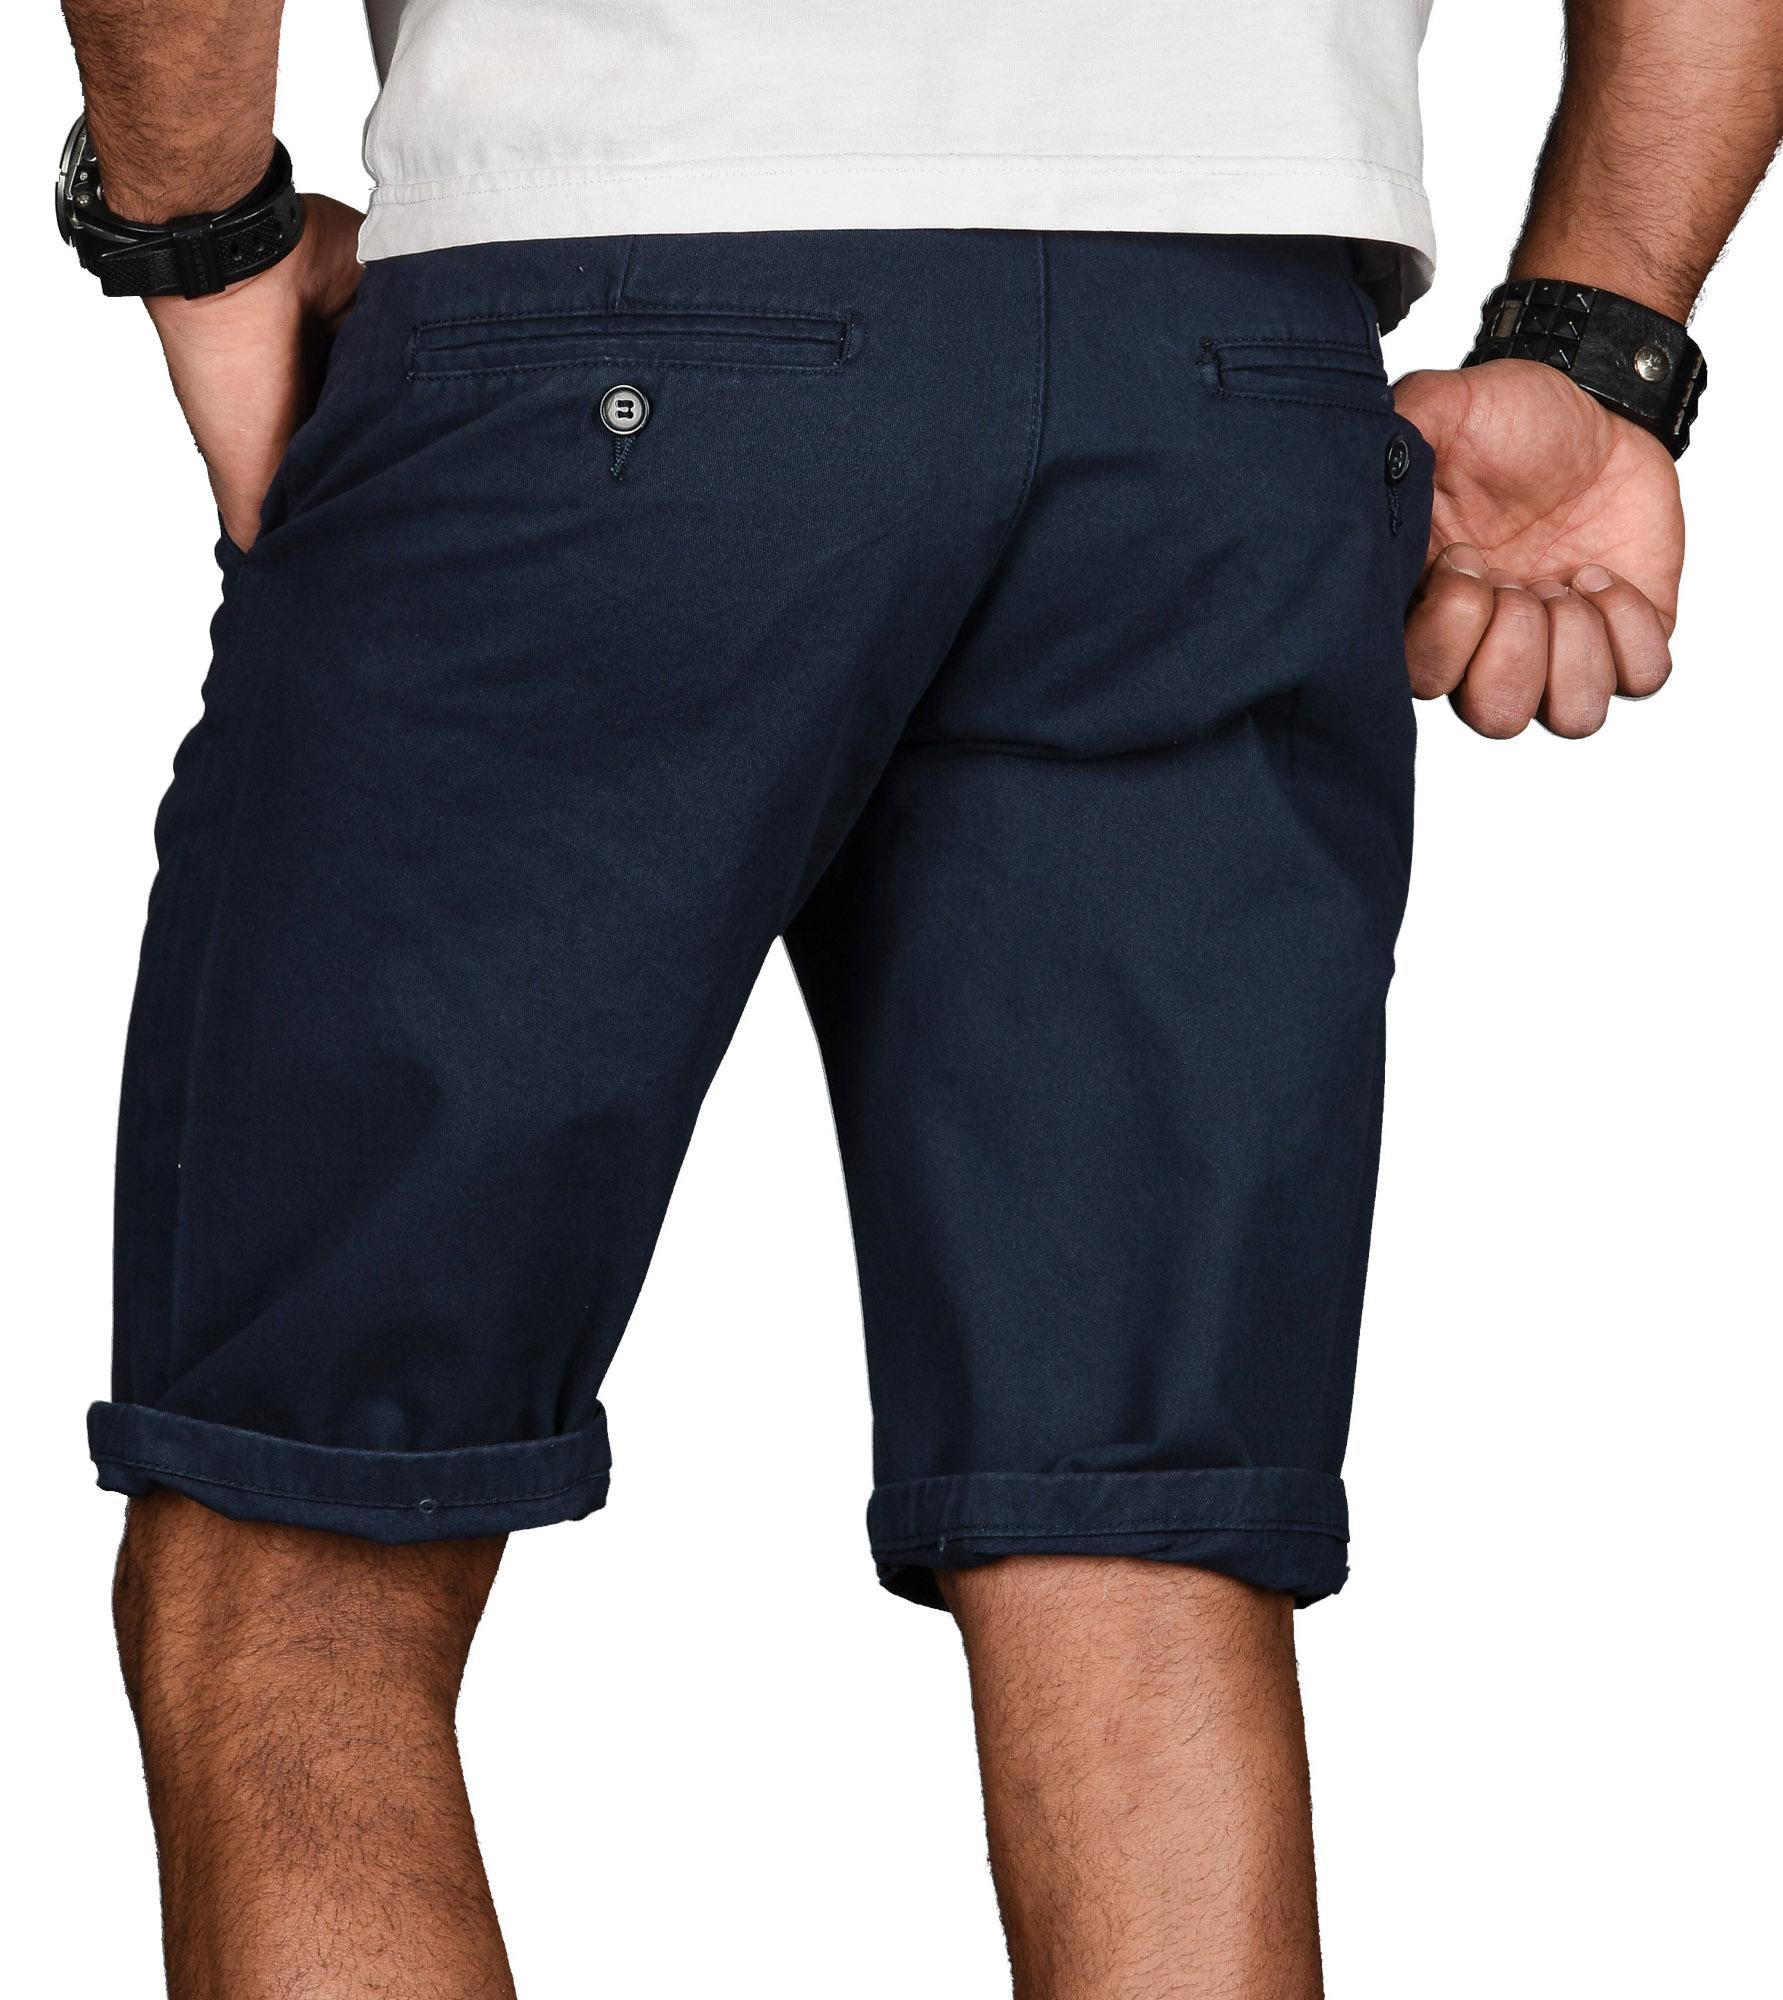 A-Salvarini-Herren-Shorts-kurze-Sommer-Hose-mit-Guertel-Short-Bermuda-NEU-AS096 Indexbild 12